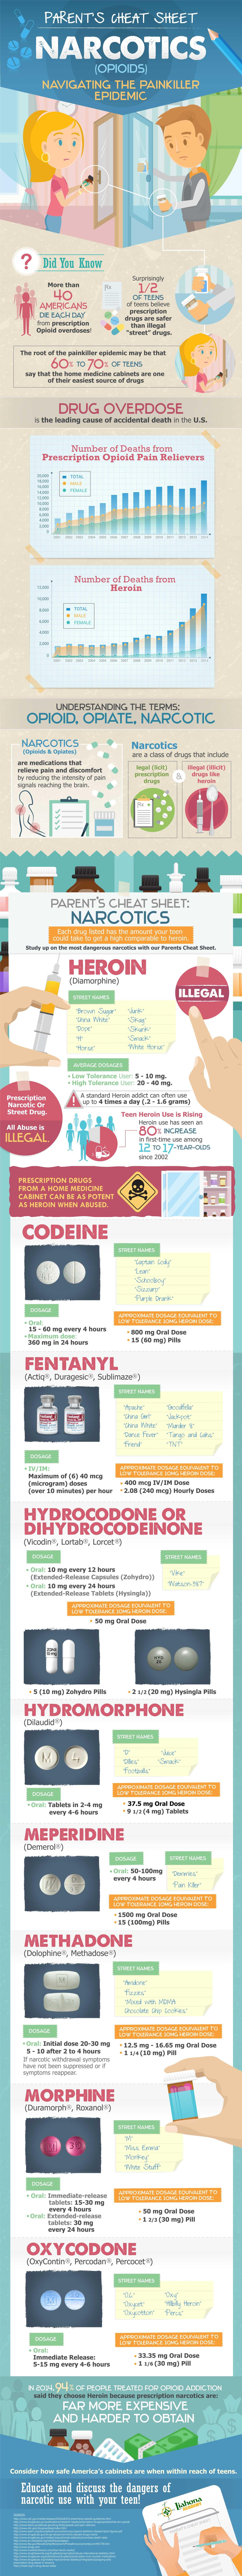 Narcotics (Opioids) - Navigating the Painkiller Epidemic